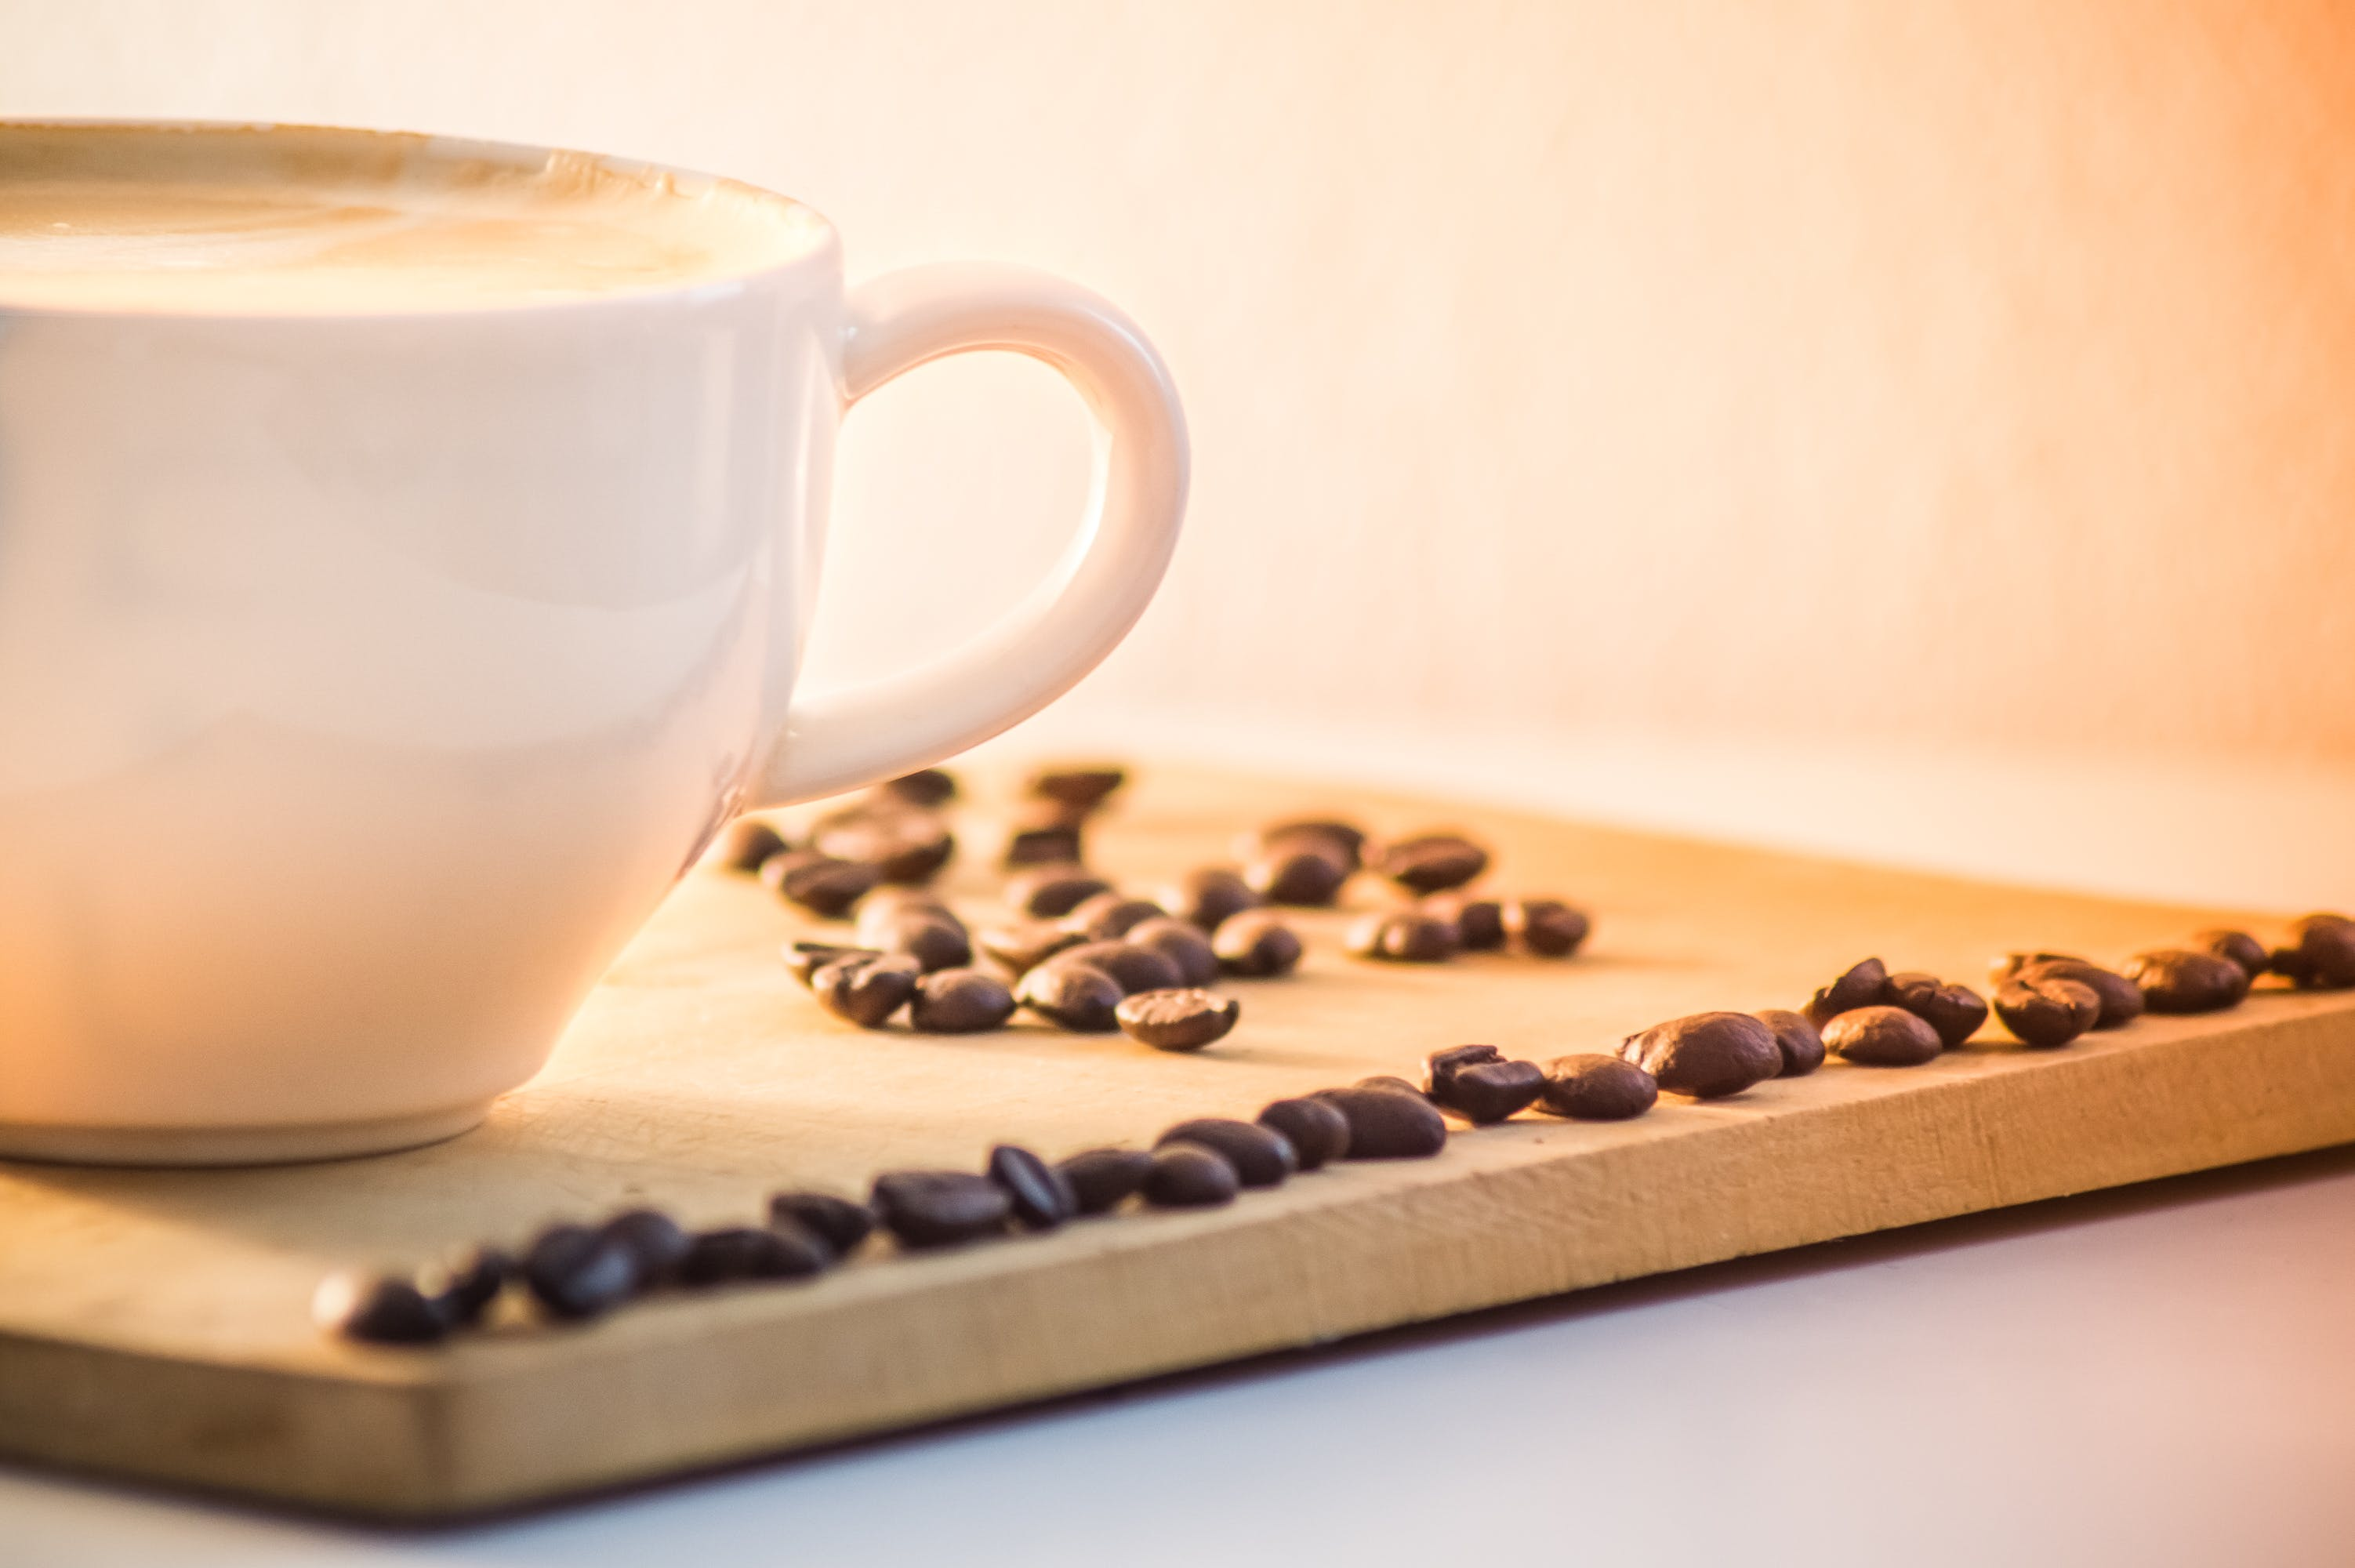 White Ceramic Coffee Mug With Cream Beside Black Coffee Beans